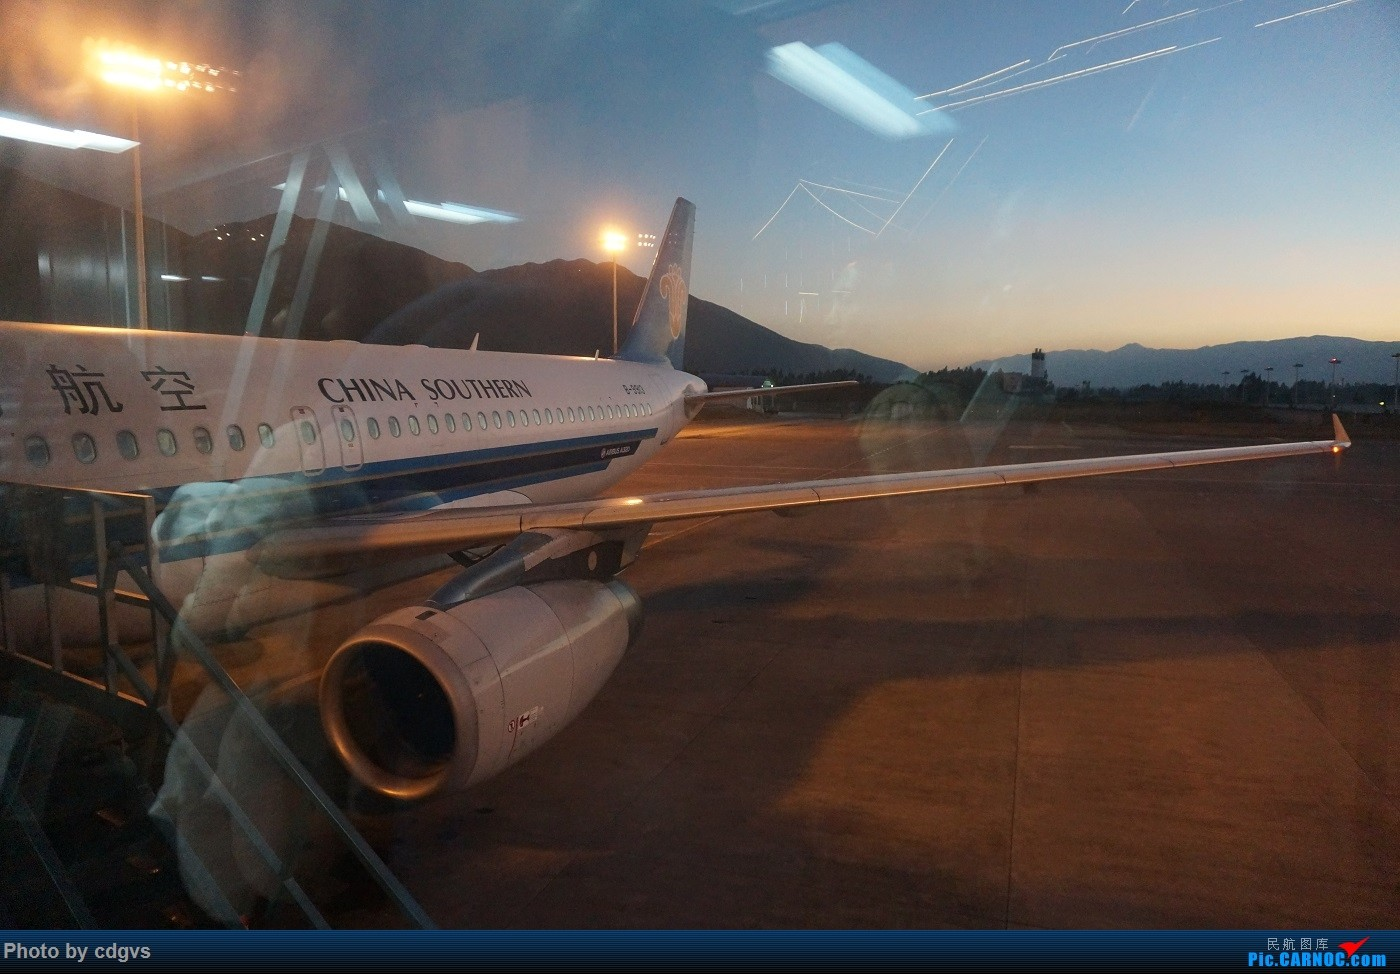 Re:[原创]KMG-LJG-KMG 东航&南航 省内刷航段,飞空客波音两种不同机型 AIRBUS A320-200 B-9931 中国丽江三义机场